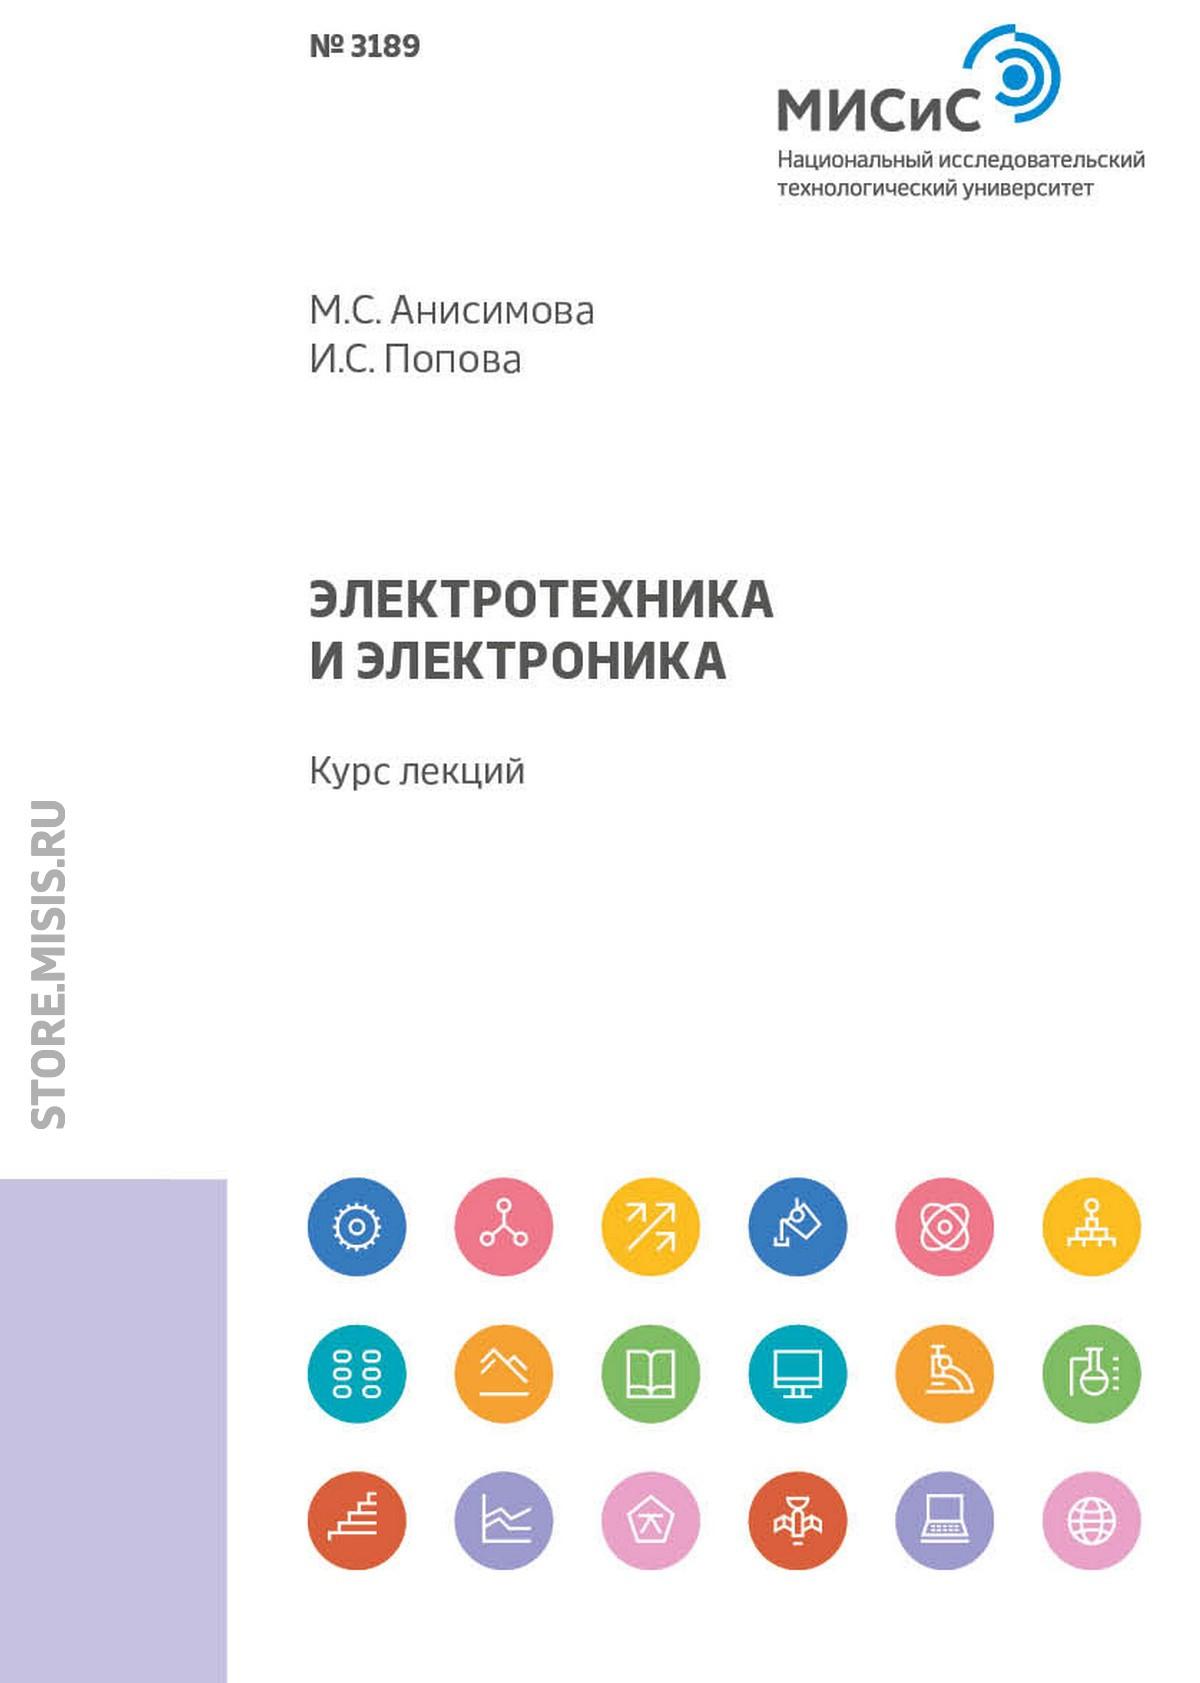 Электротехника и электроника. Курс лекций